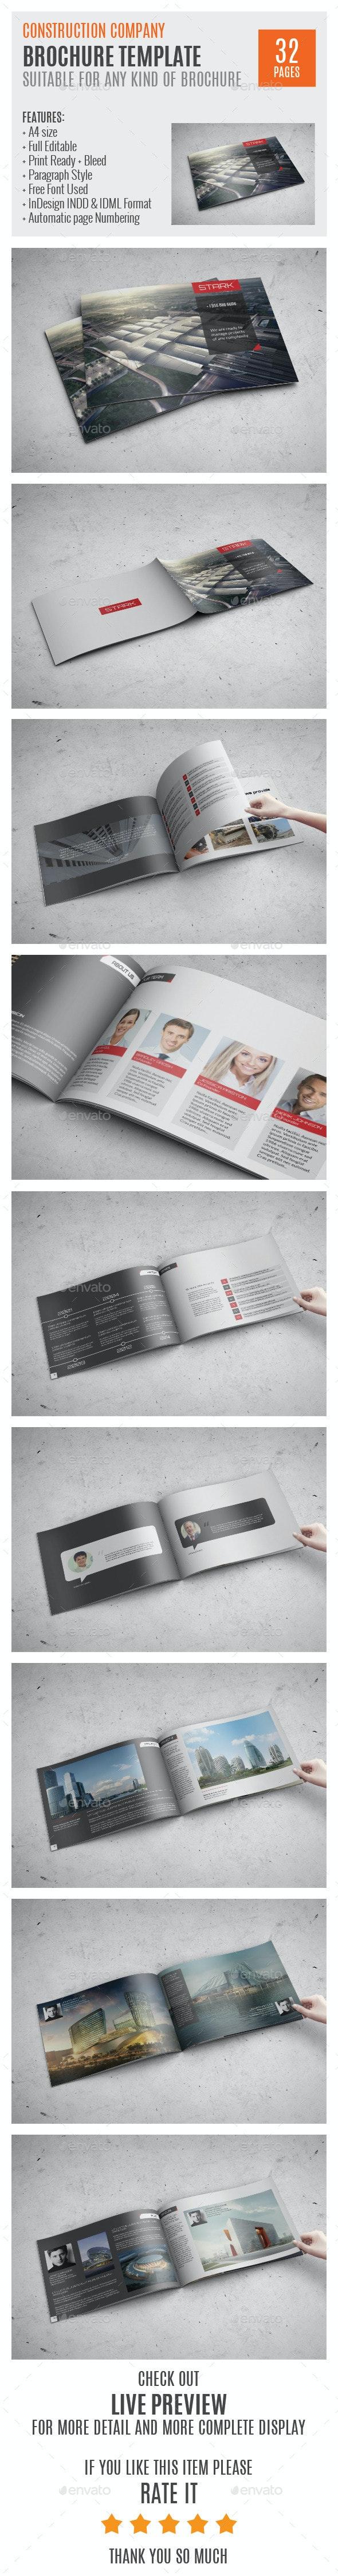 Construction Company A4 Profile Template 0039 - Brochures Print Templates